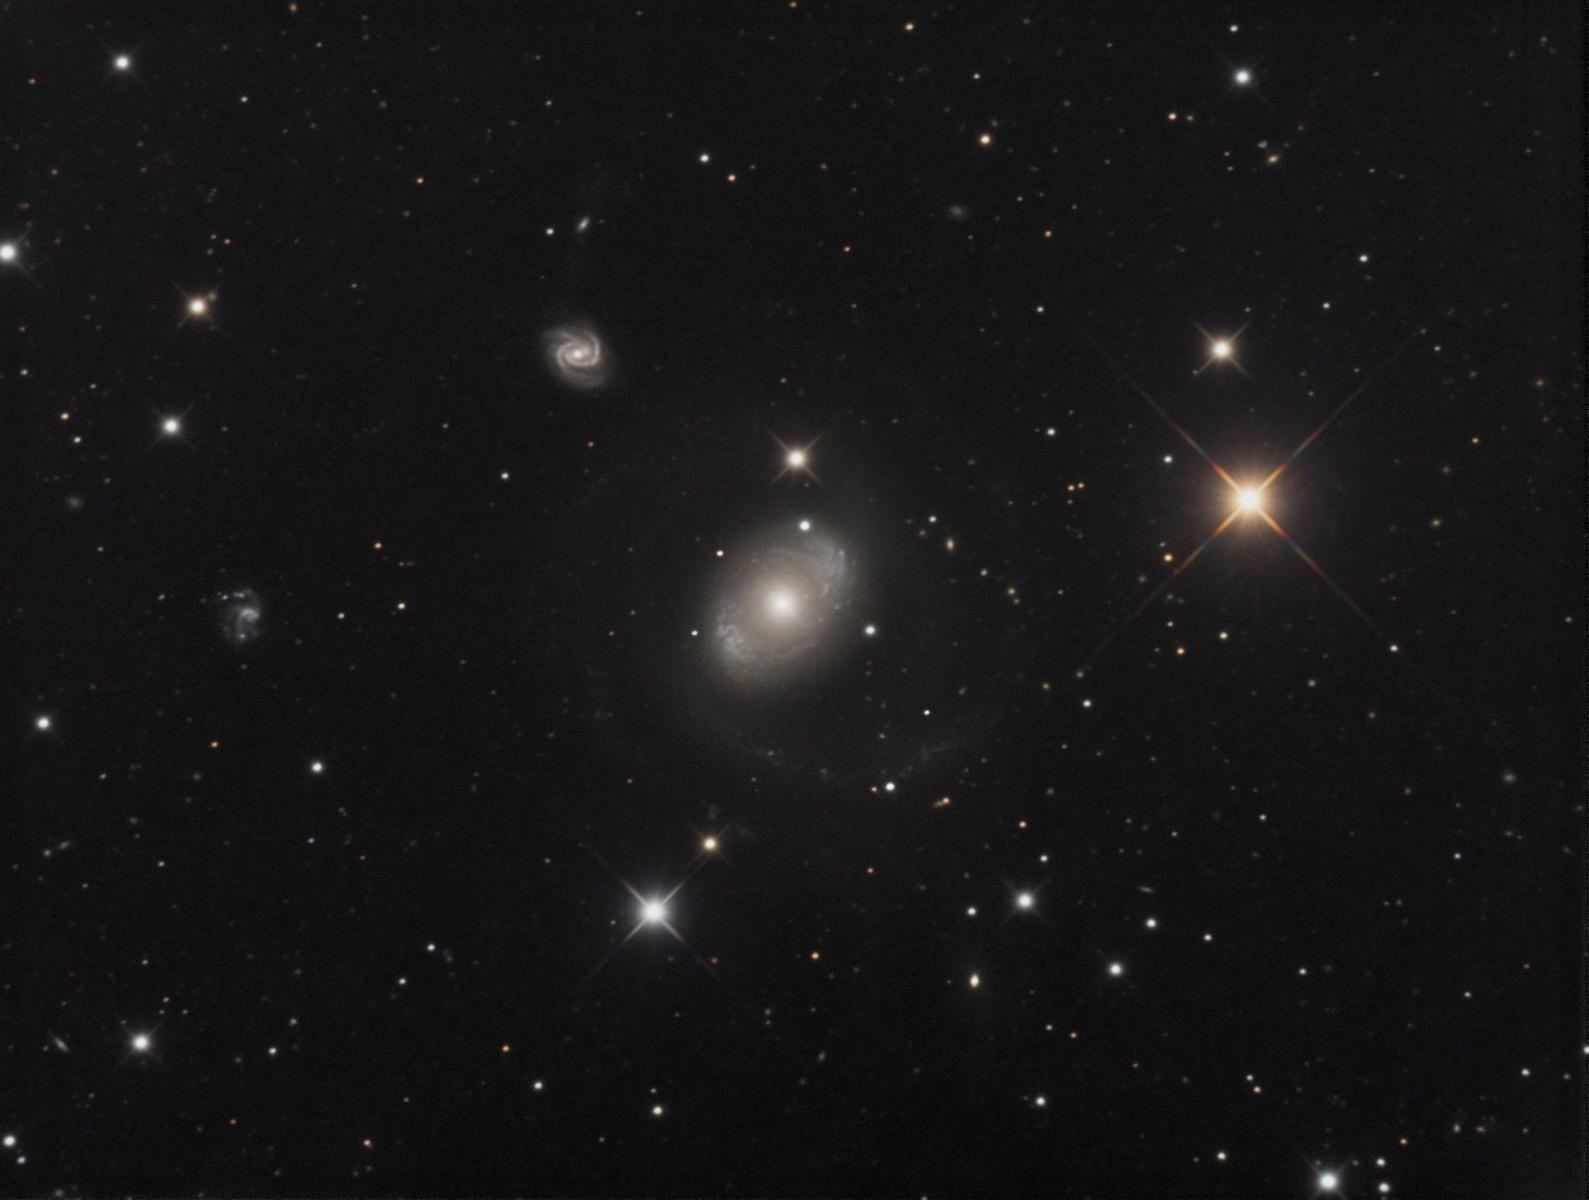 NGC%204151%20-%20CN%20-%20LRGB.jpg